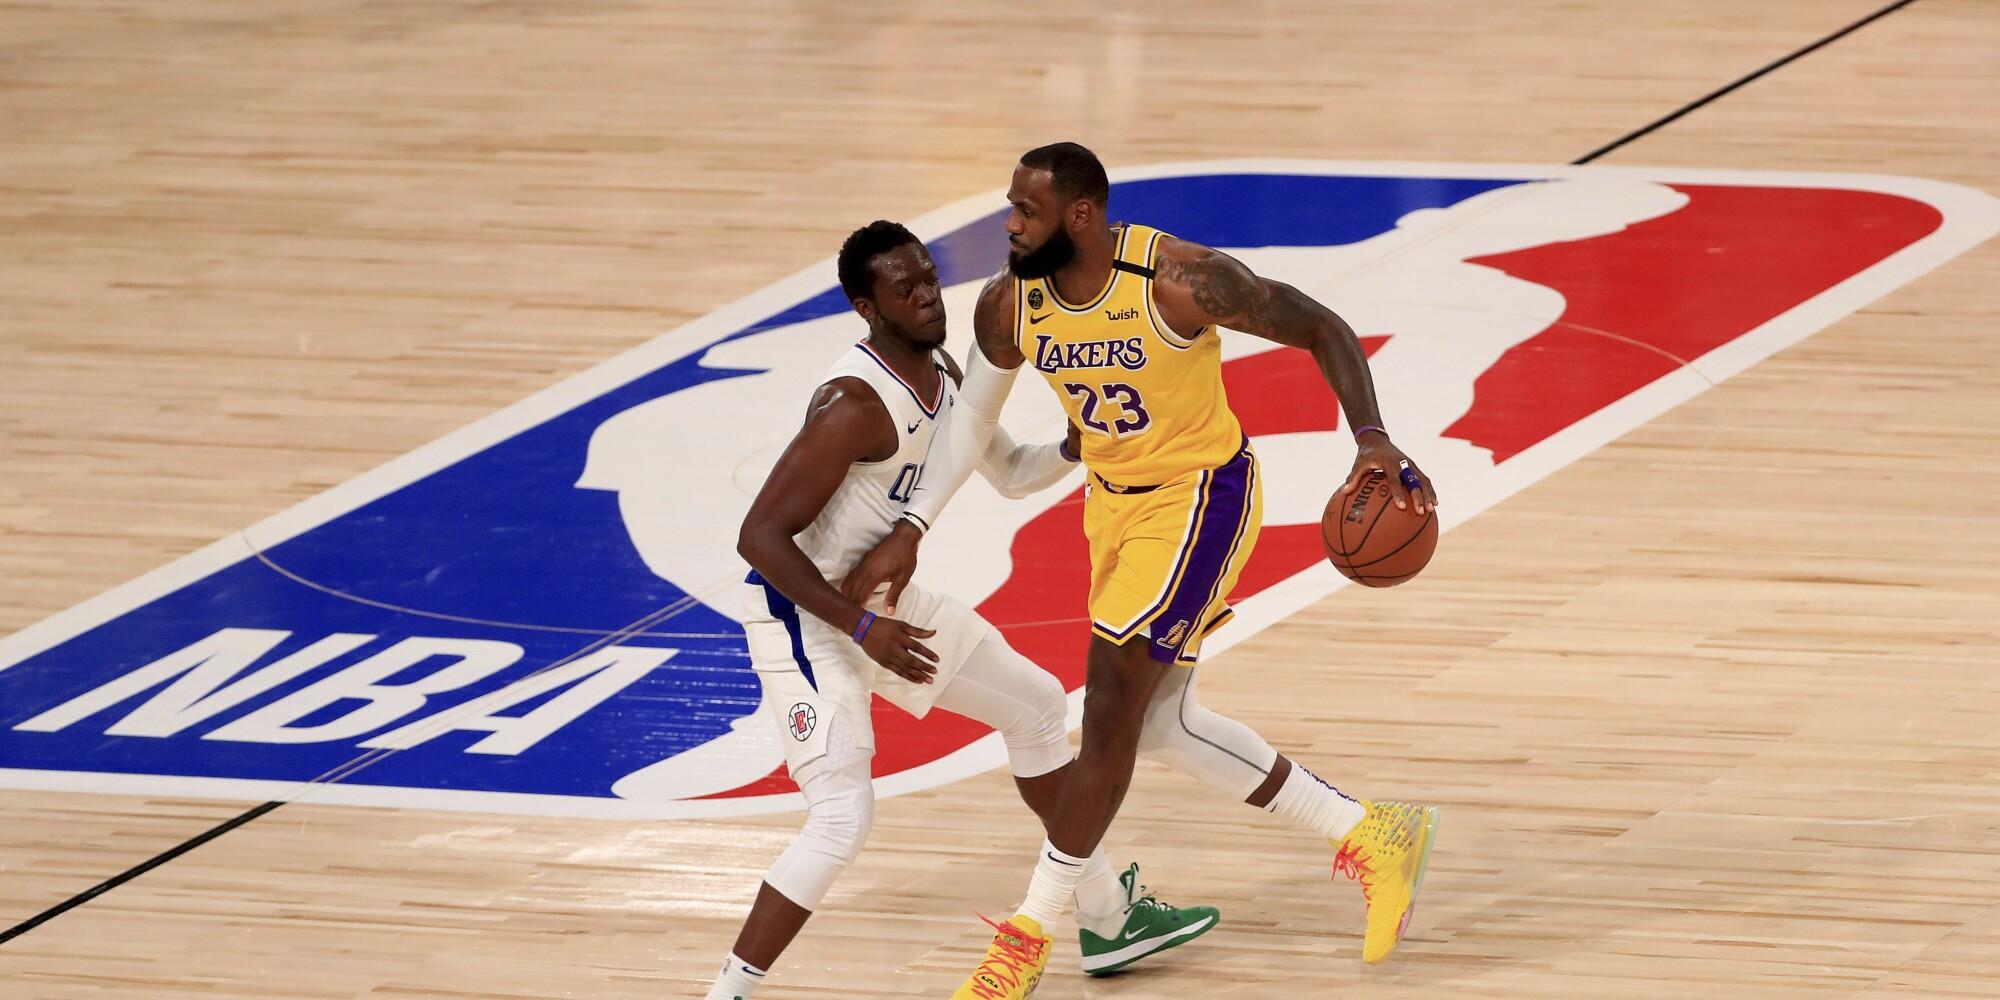 LeBron James brings the ball up court against Reggie Jackson.